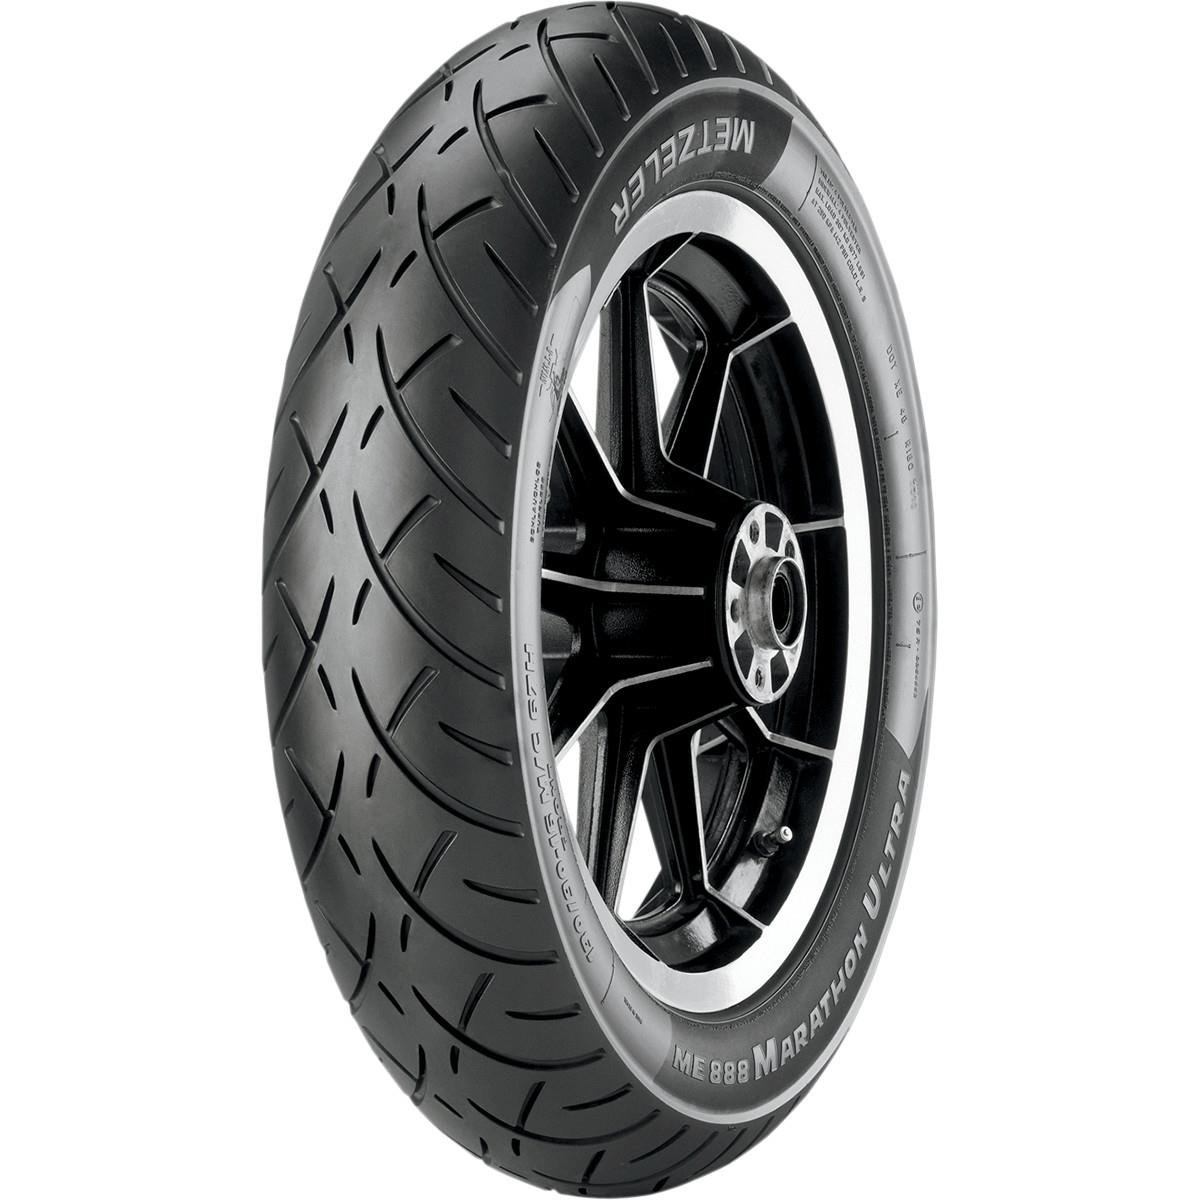 Metzeler ME888 Marathon Ultra 80/90-21 Front Tire